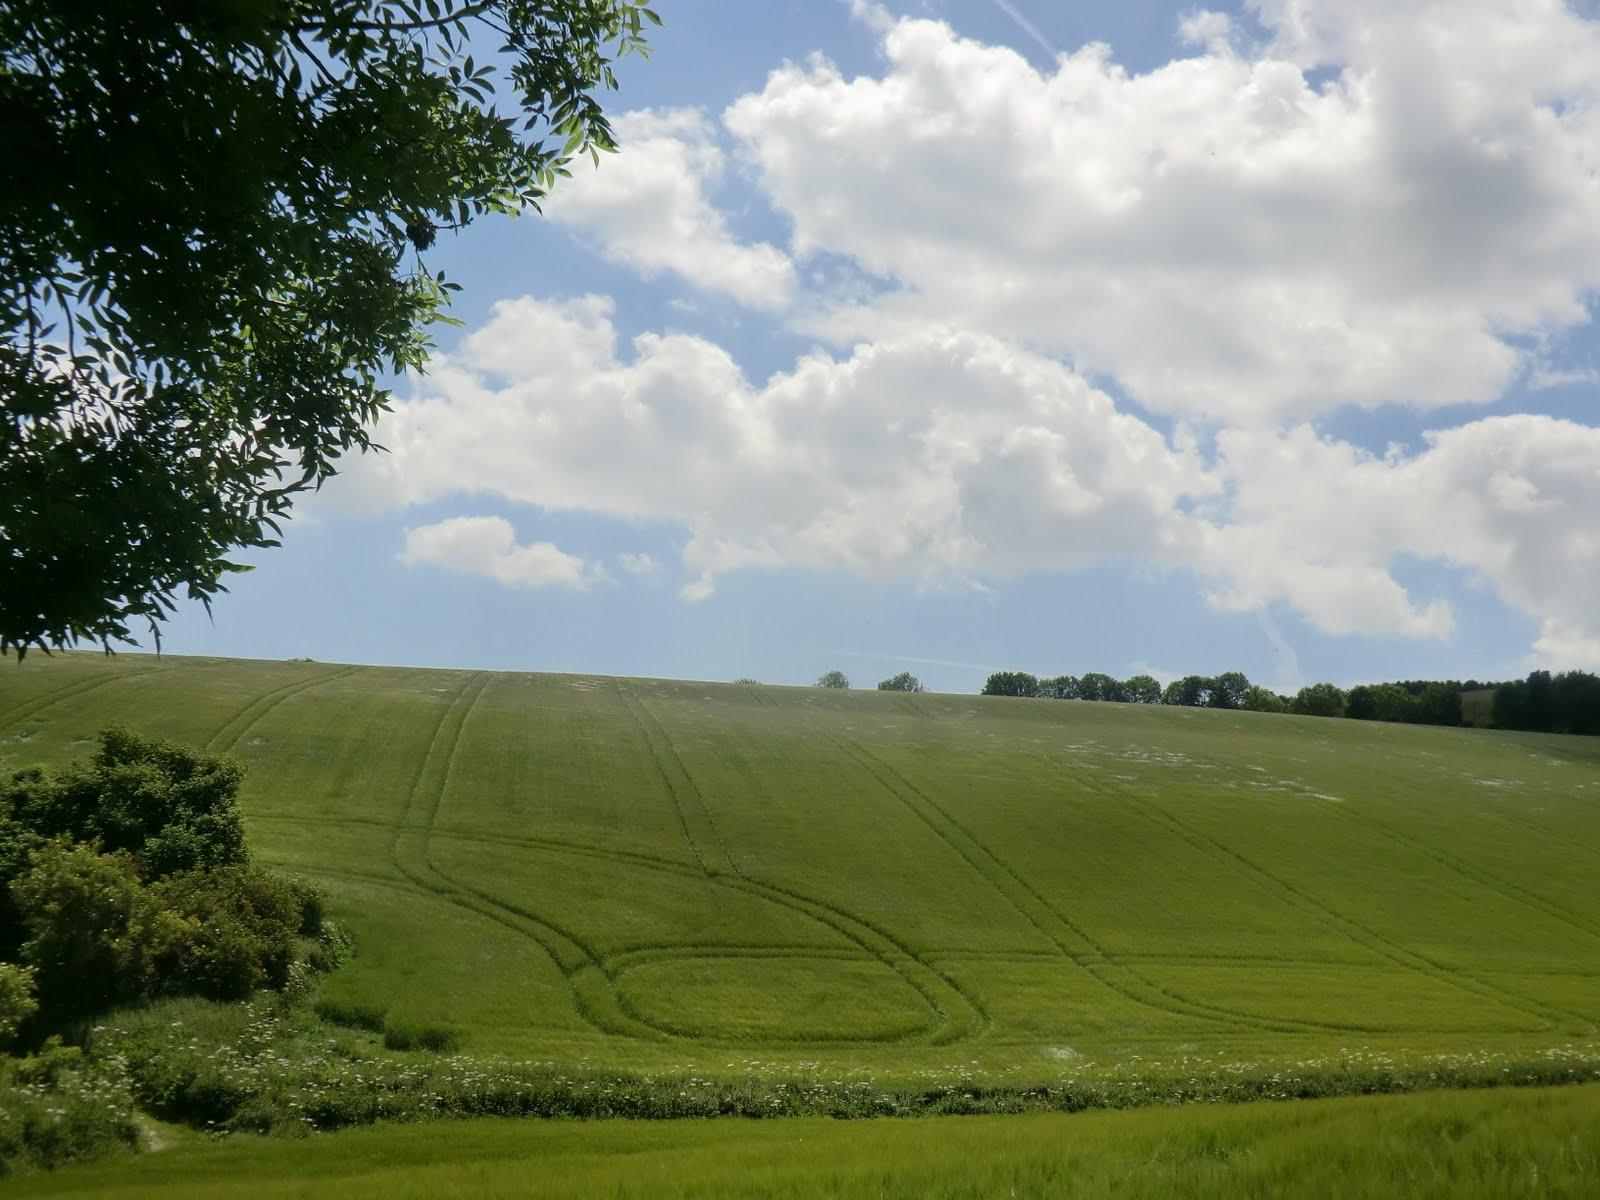 CIMG8824 Tracks through the crops, South Stoke Farm